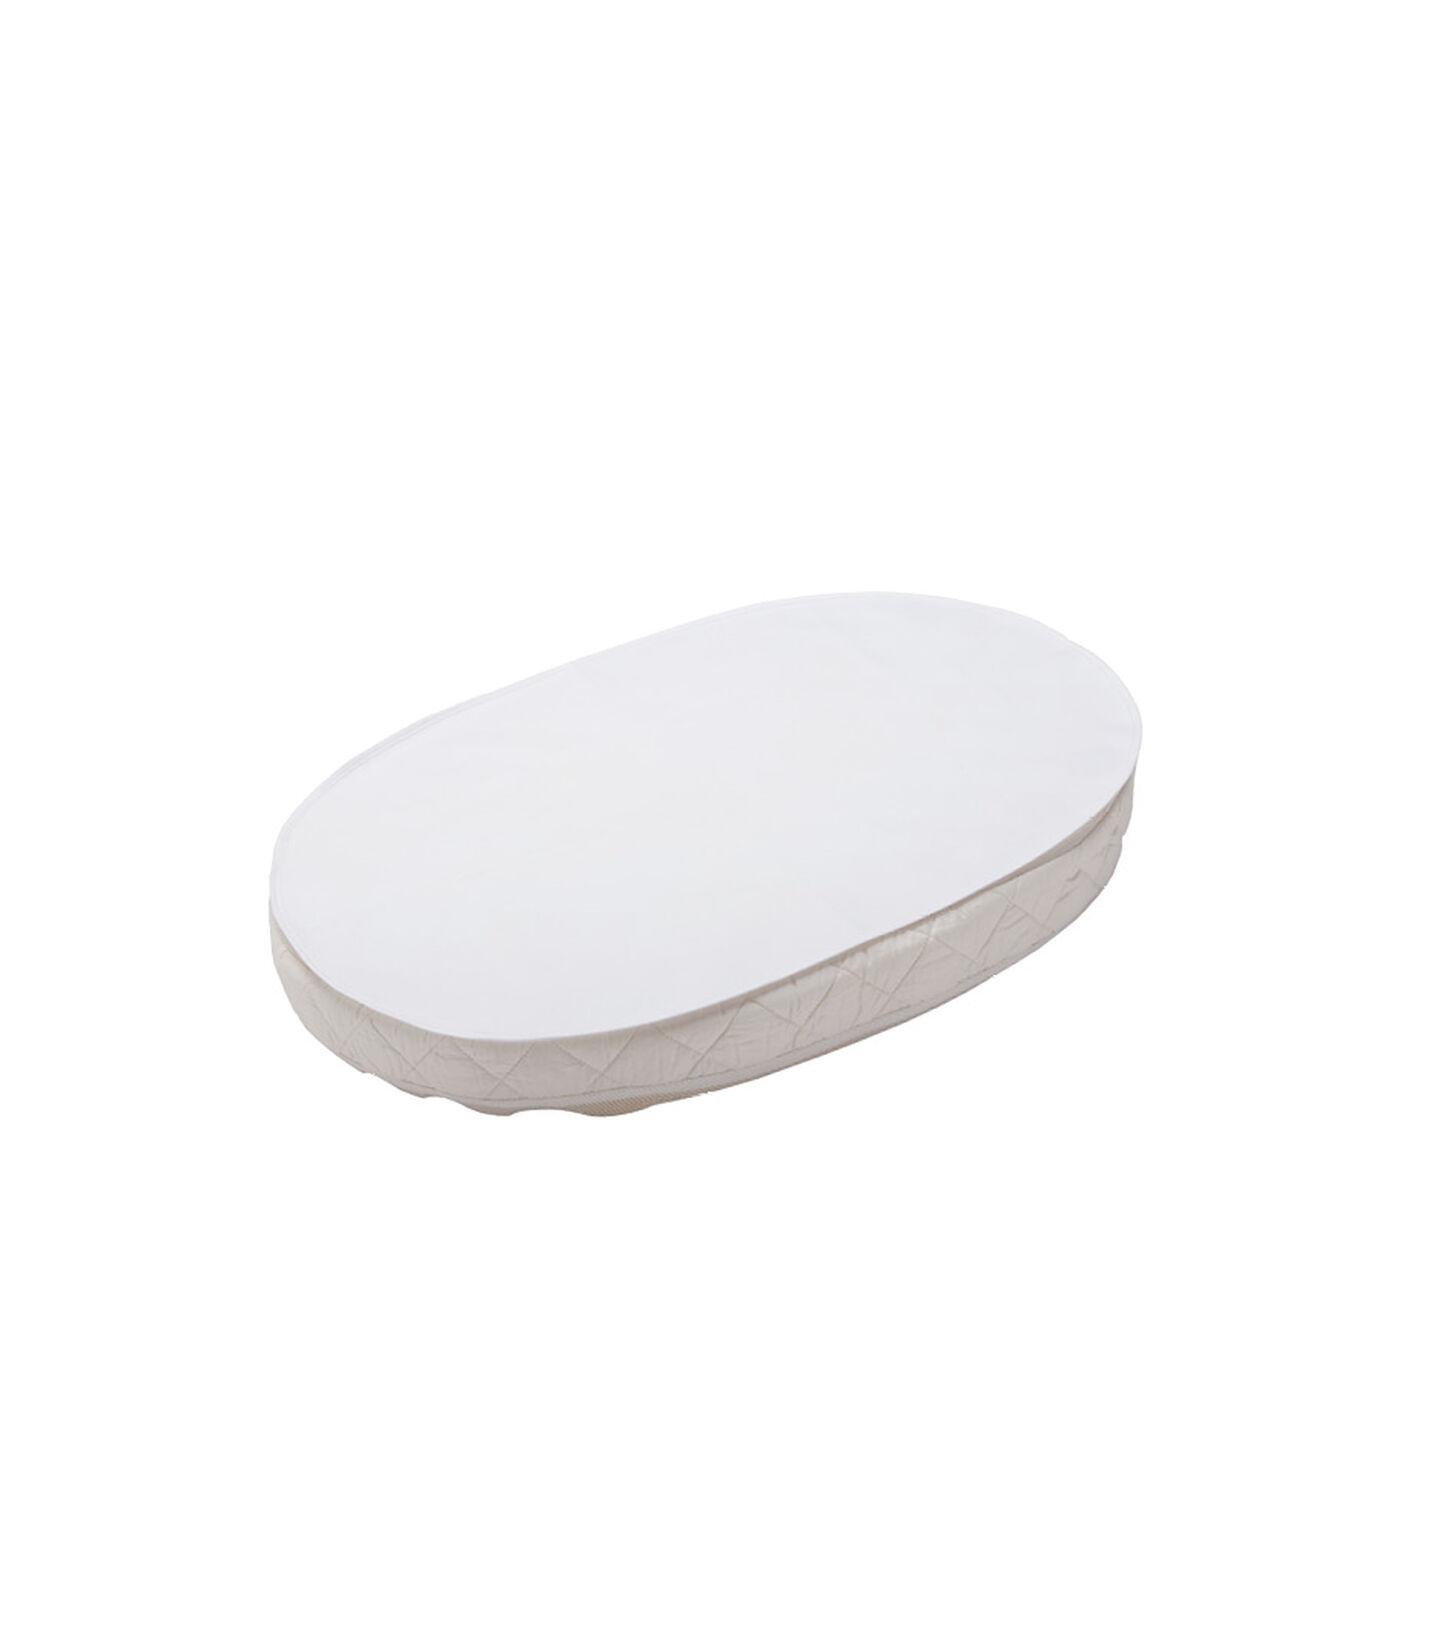 Stokke® Sleepi™ Mini Telo Ovale Salvapipì, , mainview view 2